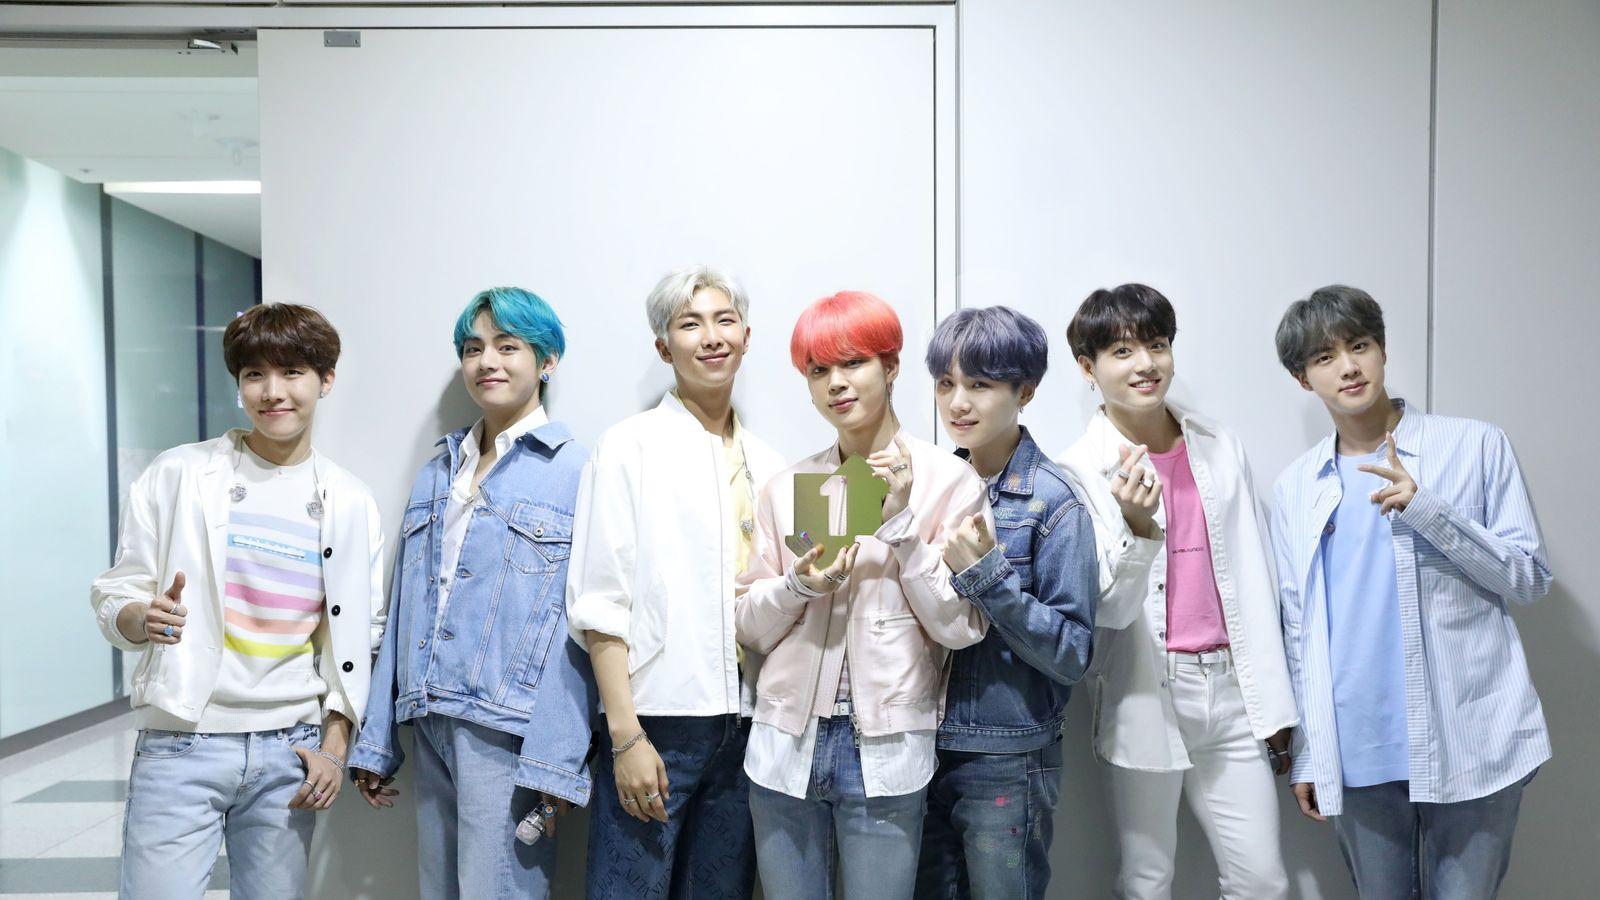 K-pop stars BTS hit number one spot in UK album chart